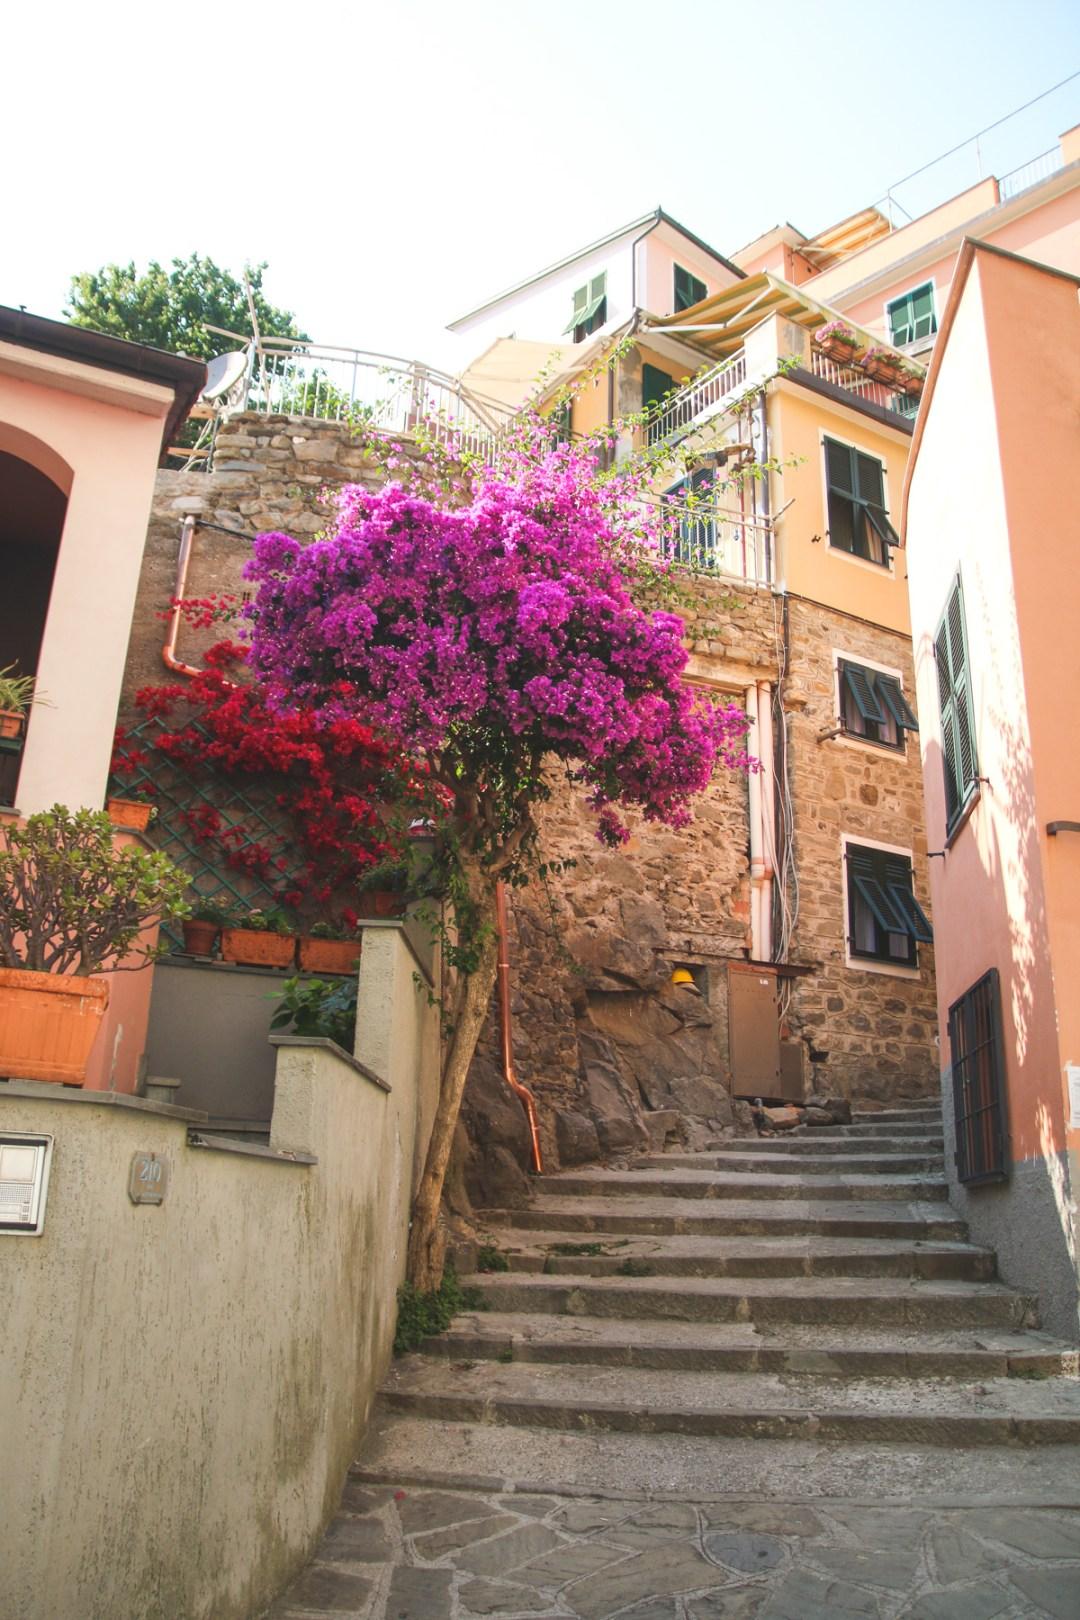 Wandering the Colourful Backstreets of Manarola in Cinque Terre, Liguria, Italy